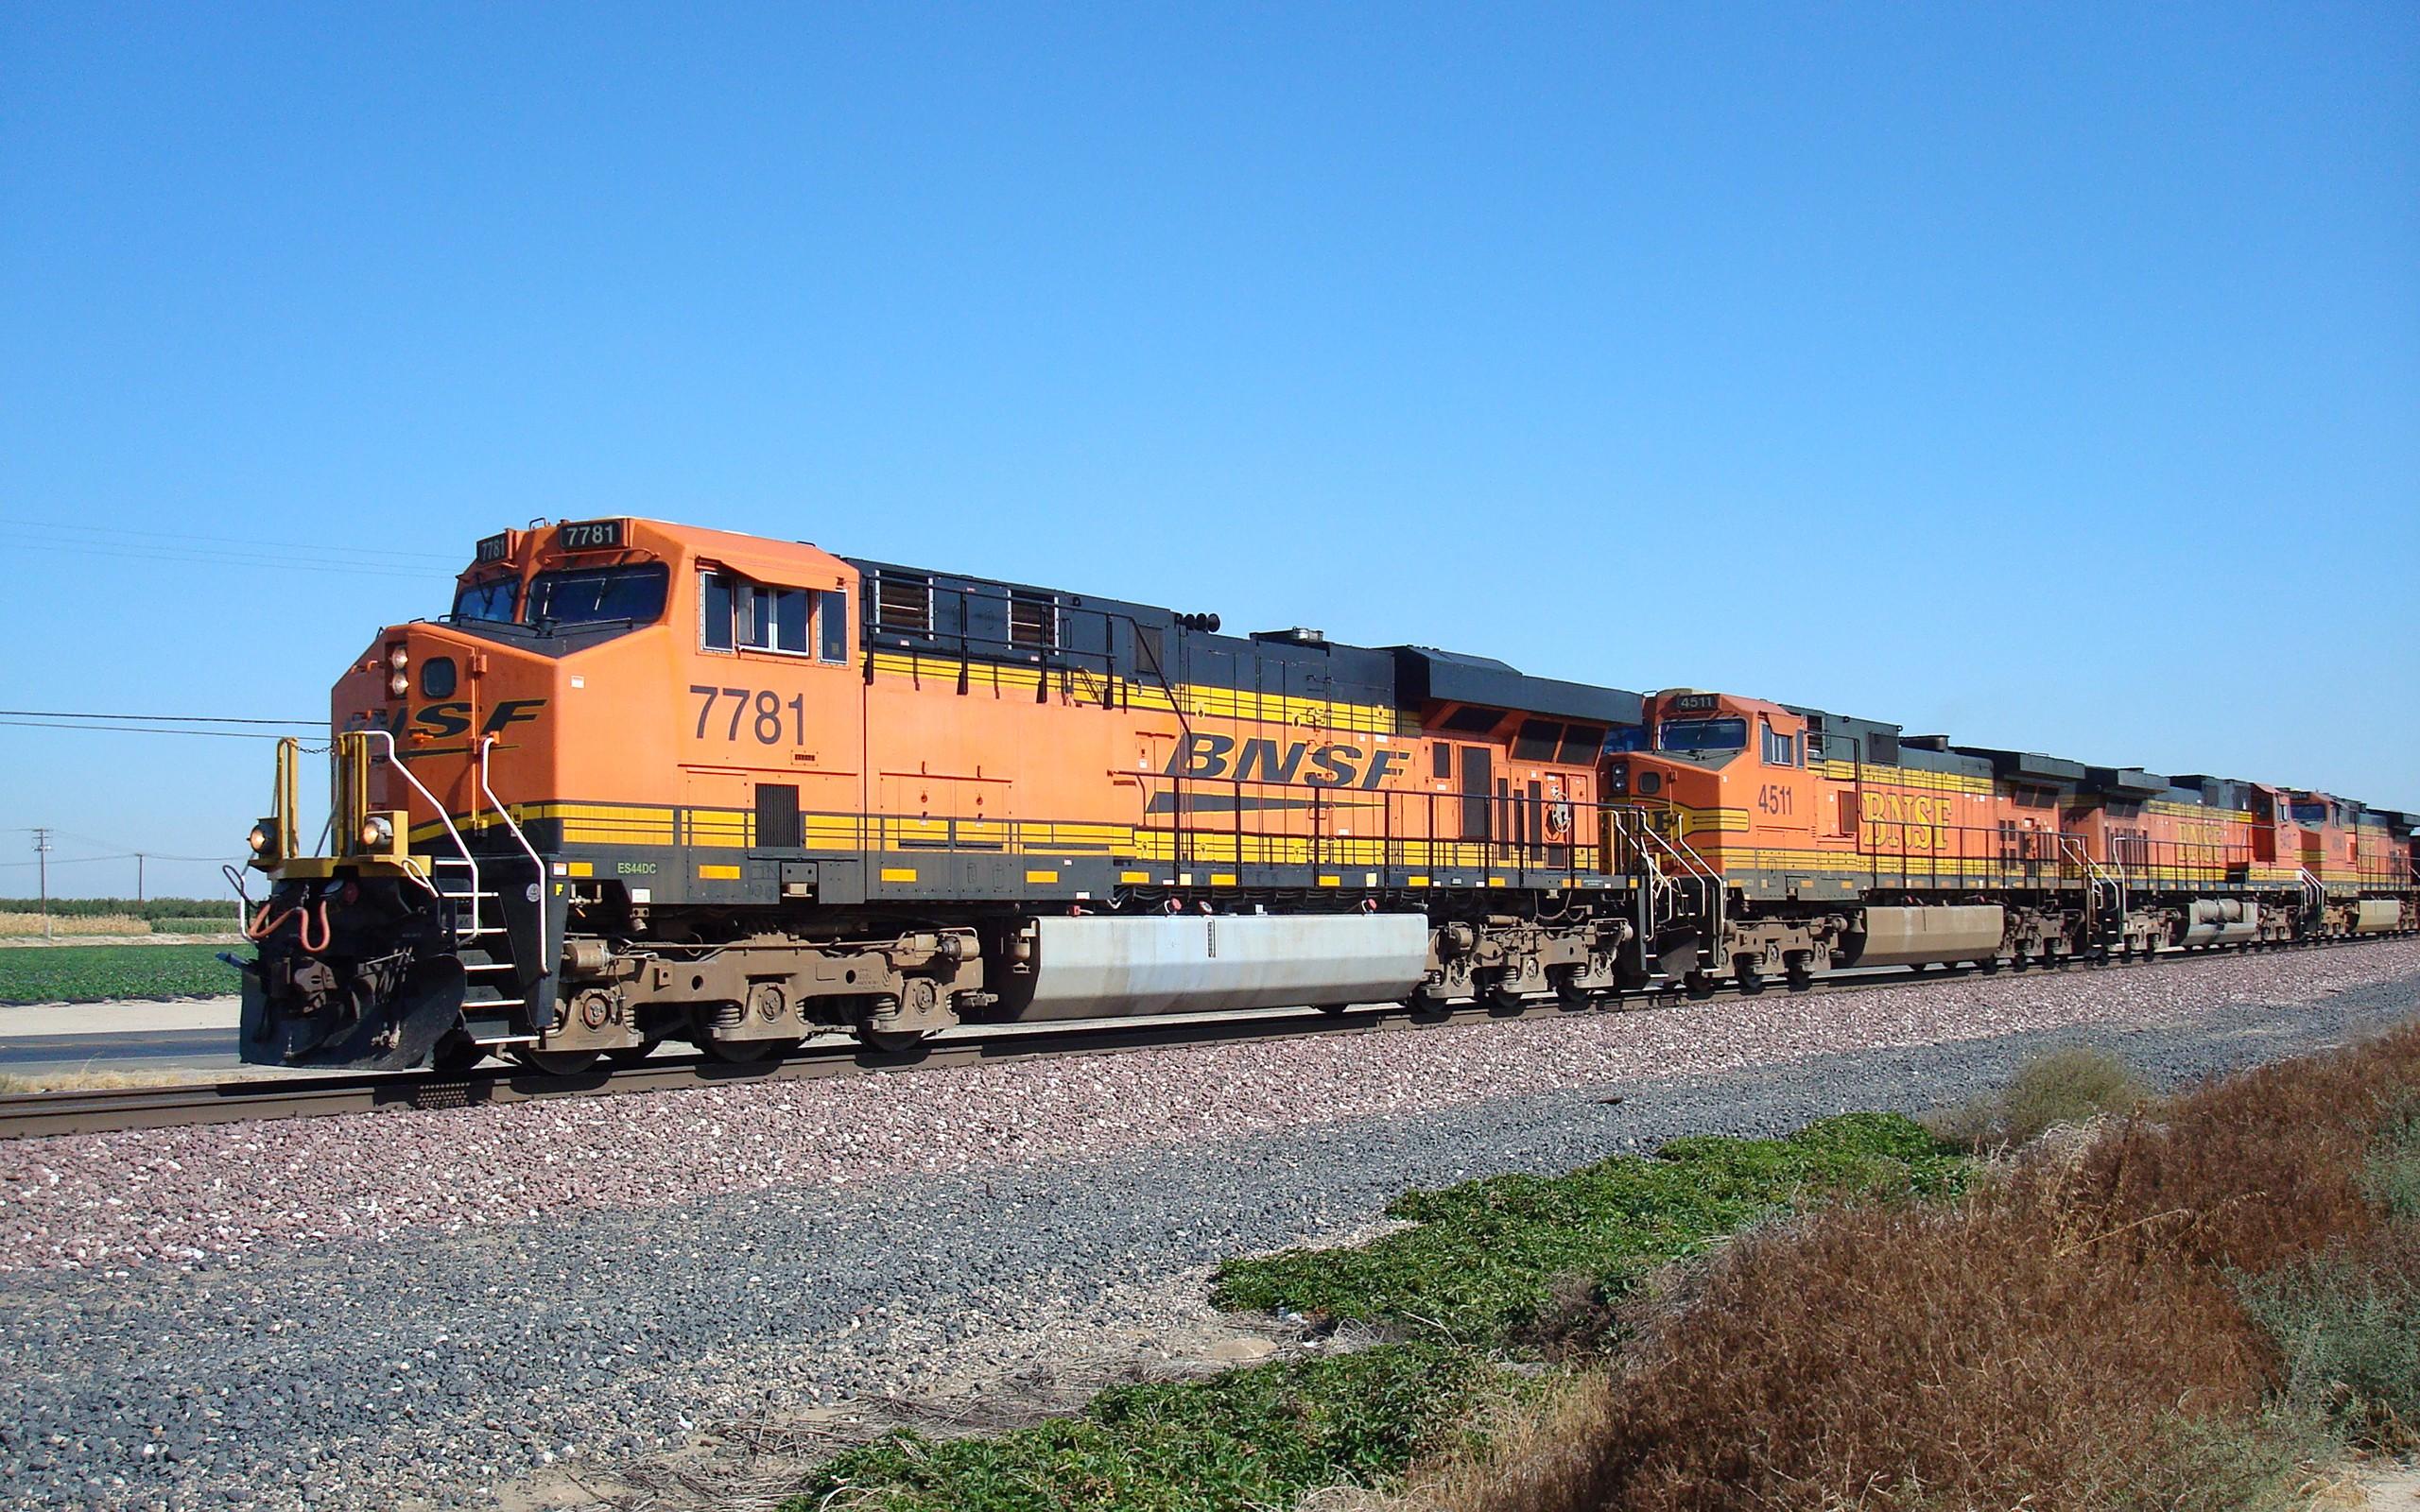 General 2560x1600 freight train diesel locomotive train